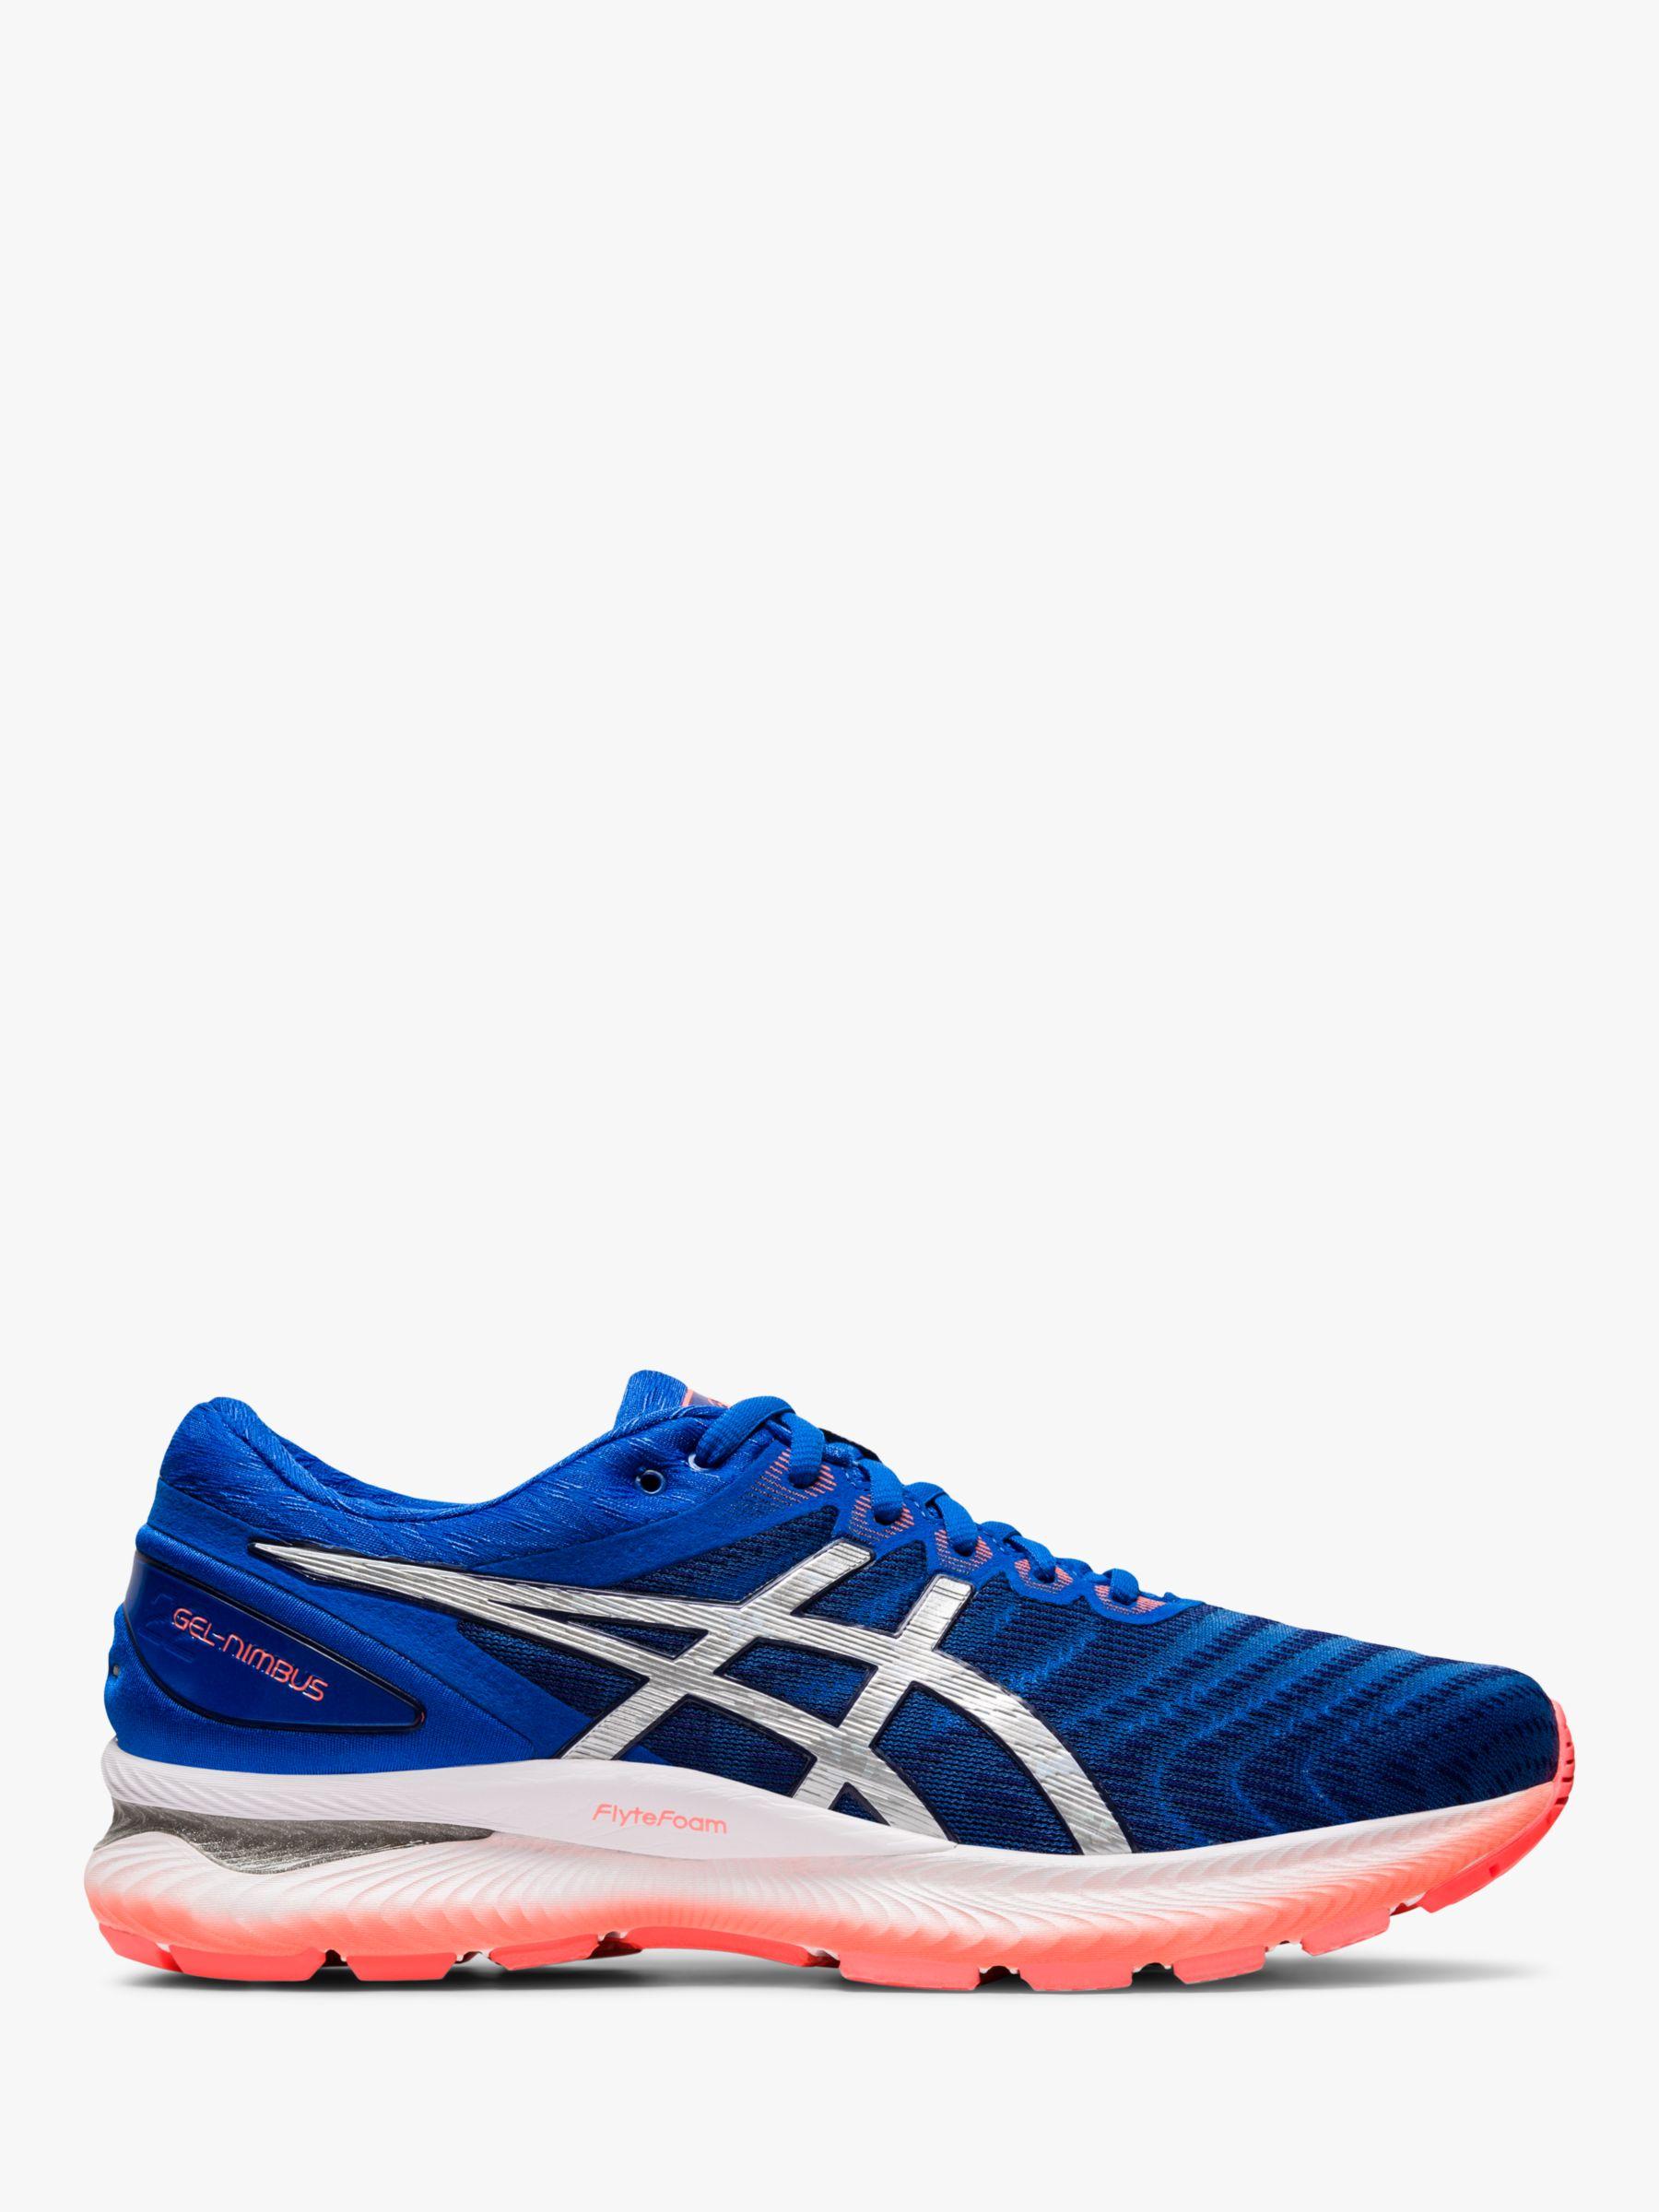 ASICS ASICS GEL-NIMBUS 22 Men's Running Shoes, Tuna Blue/Pure Silver